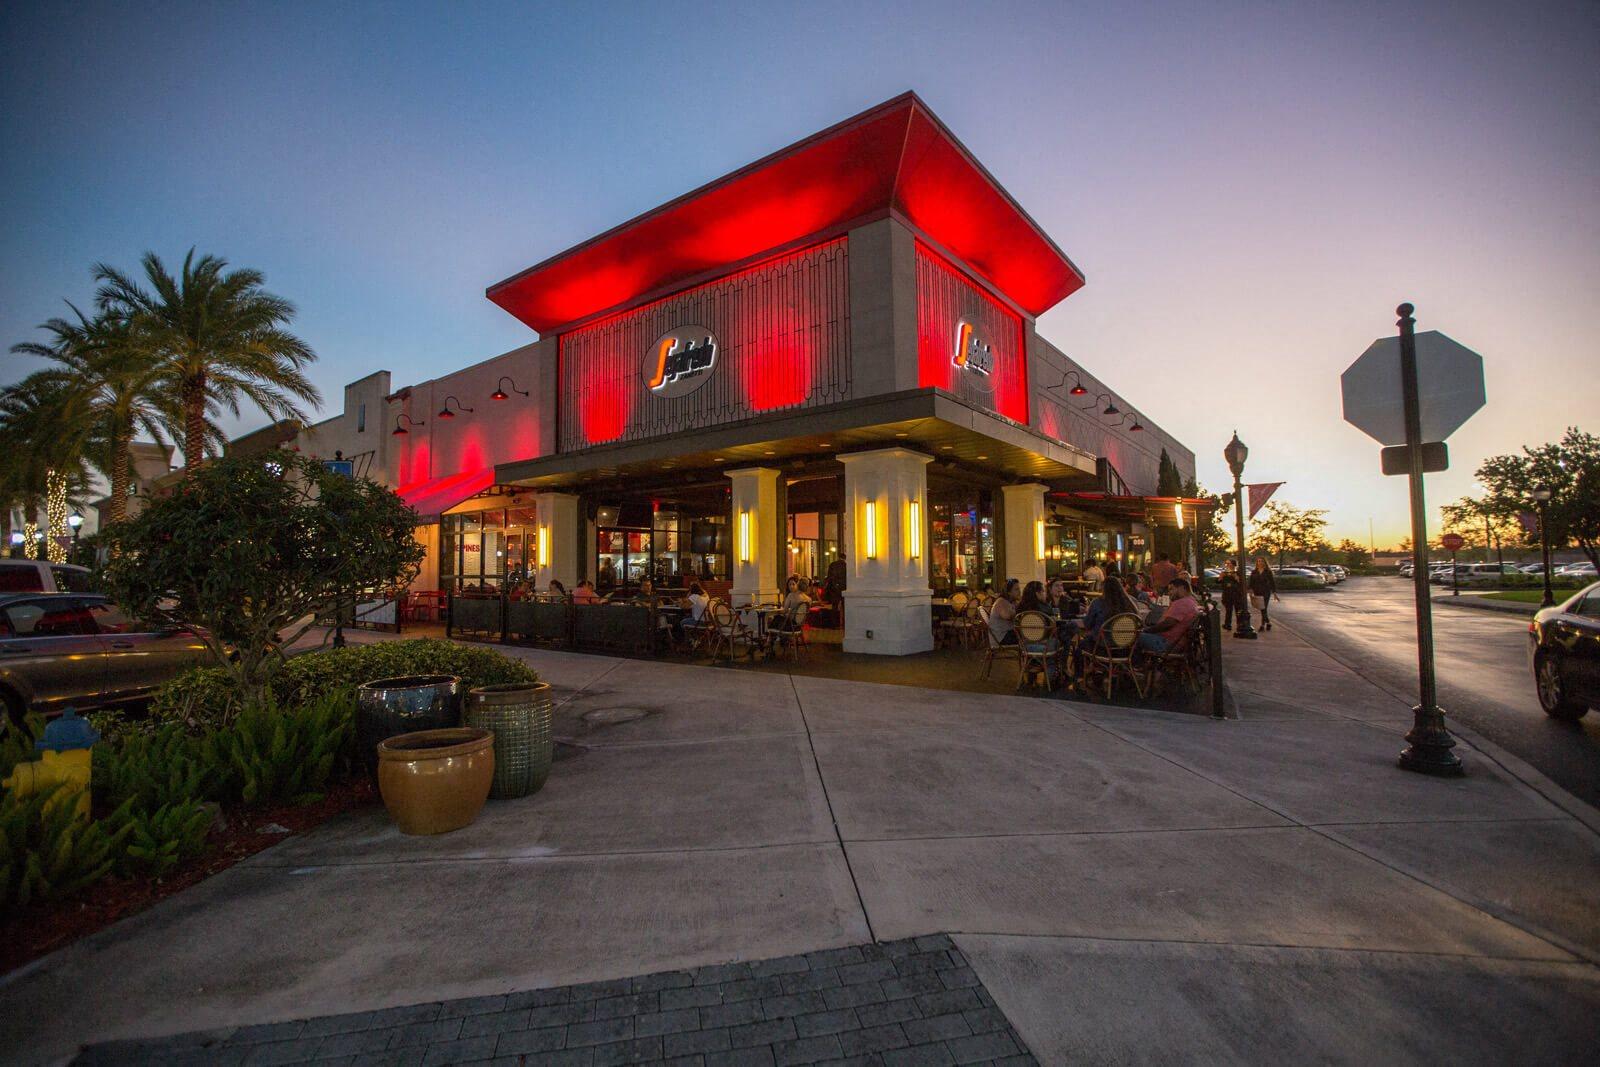 Patio dining options galore around Windsor at Miramar, 3701 Southwest 160th Avenue, Miramar